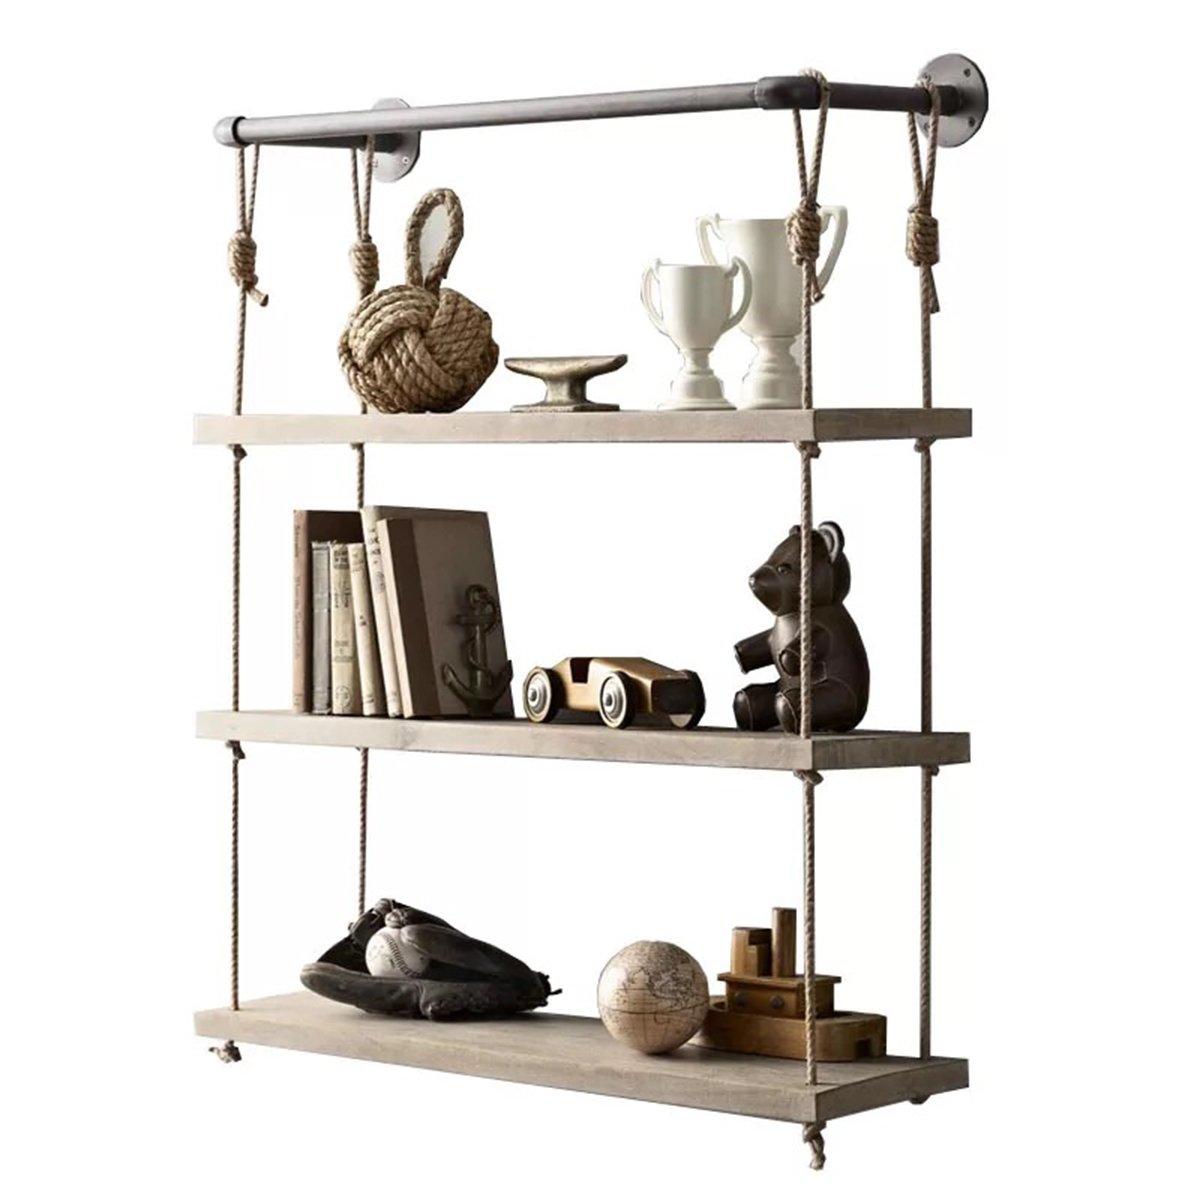 warm van 24 industrial metal and wood wall mount shelves hanging hemp rope 663585525070 ebay. Black Bedroom Furniture Sets. Home Design Ideas